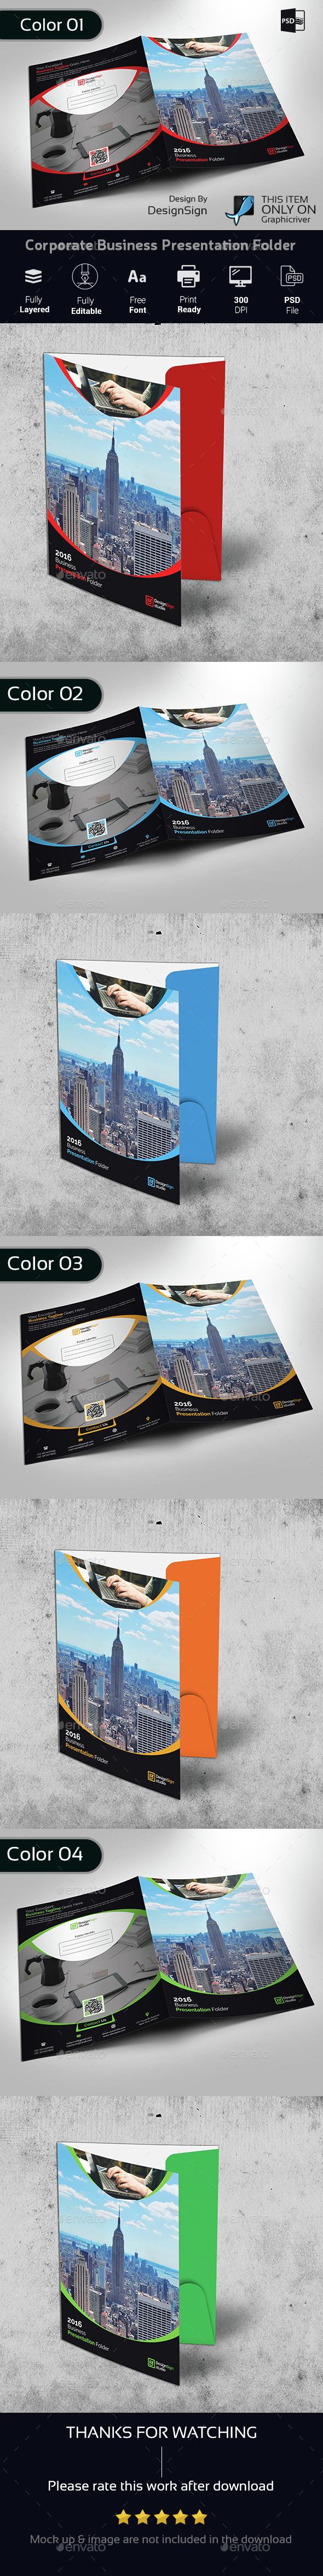 Corporate Business Presentation Folder - Stationery Print Templates